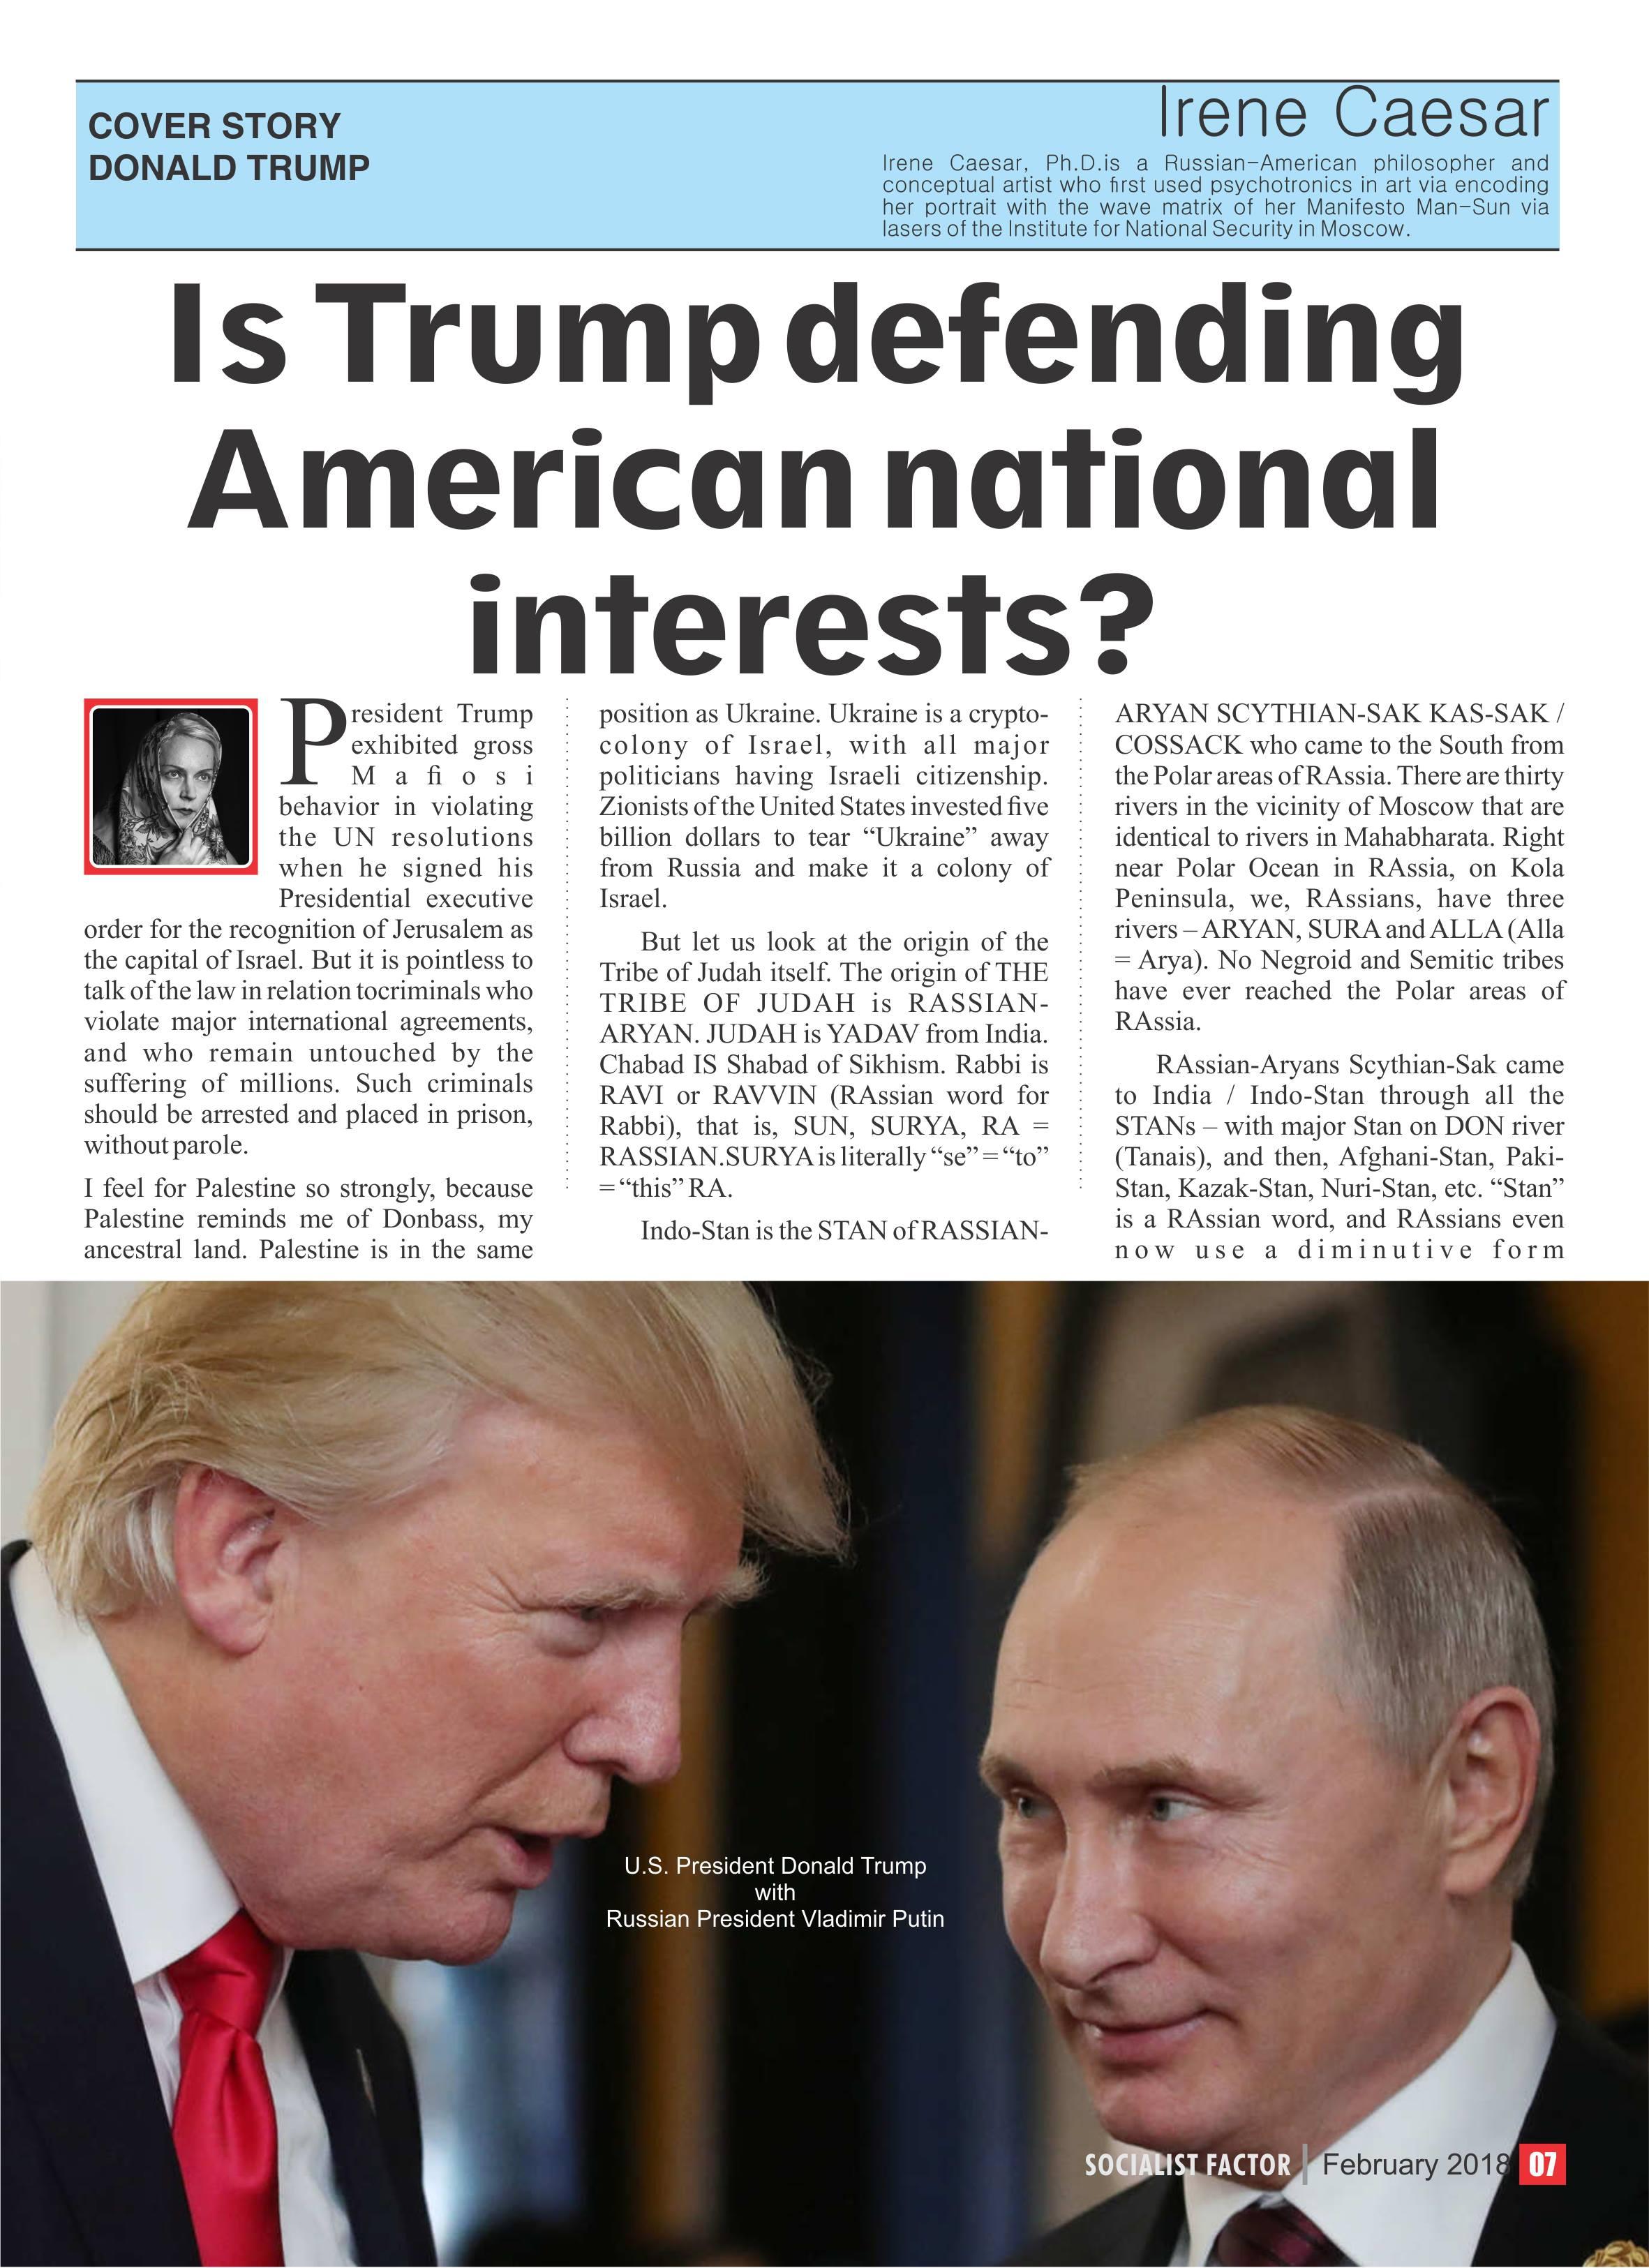 2018_2_IRENE_CAESAR_IS_TRUMP_DEFENDING_AMERICAN_NATIONAL_INTERESTS_2